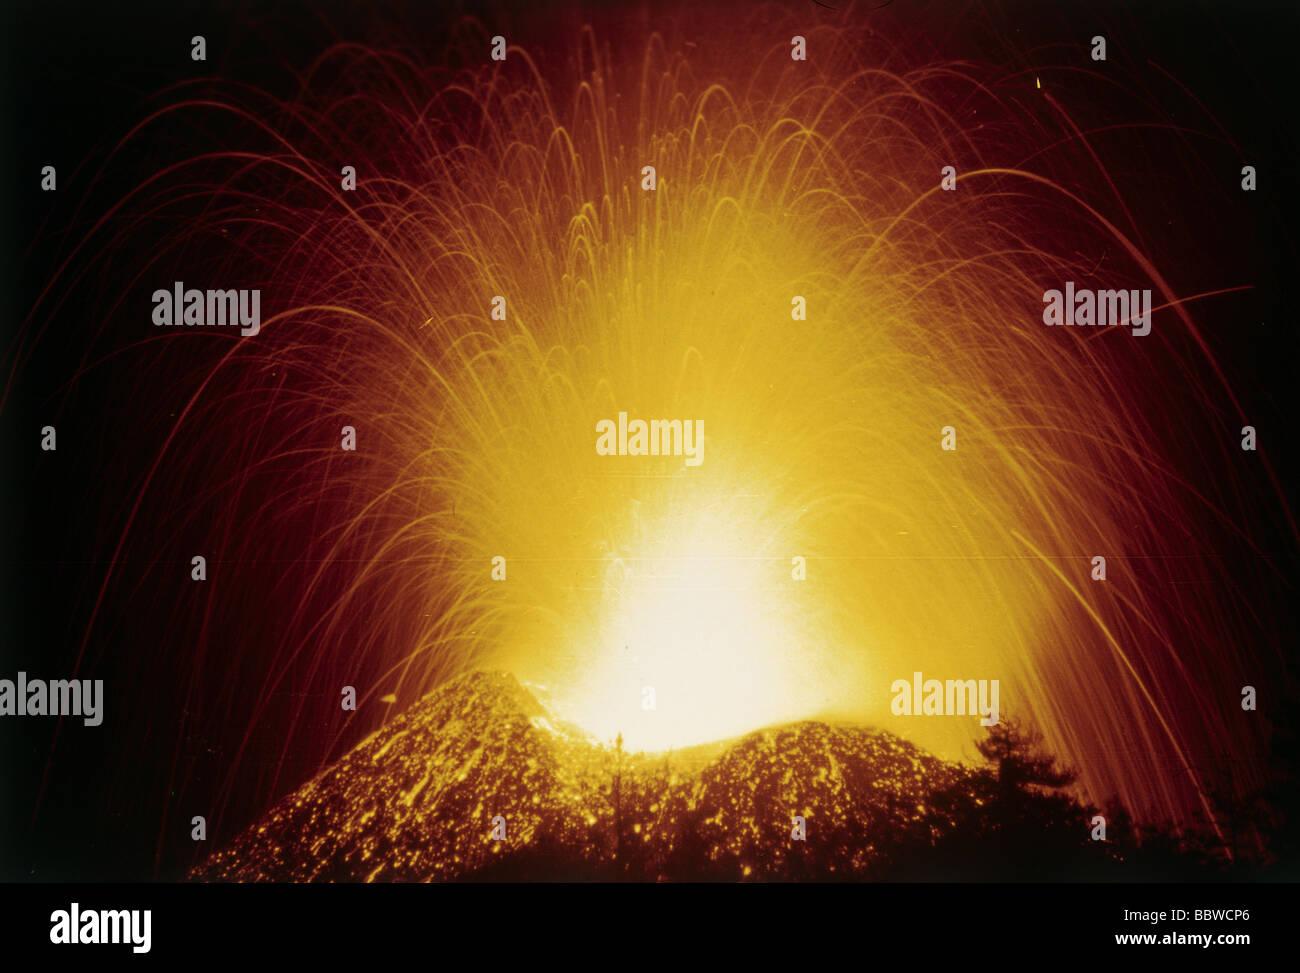 natural disaster / catastrophe, volcanic eruption, Mount Etna, during eruption, Sicily, Italy, 1984, volcanism, - Stock Image